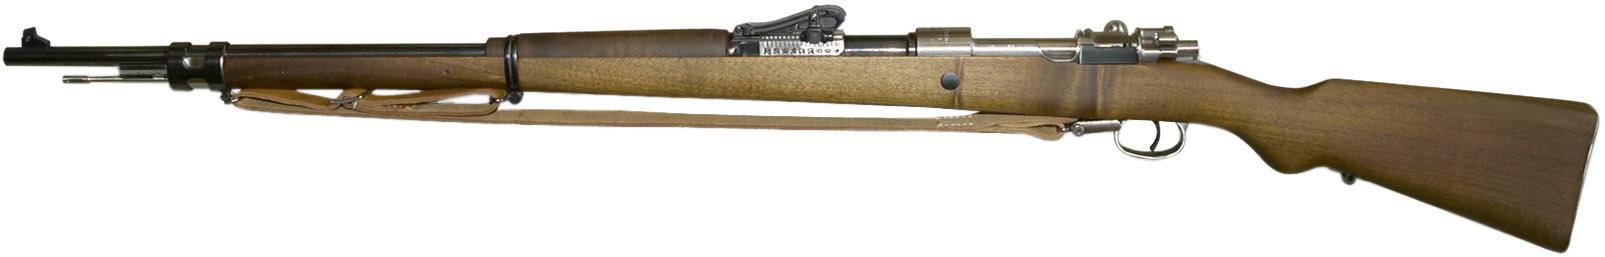 Винтовка Mauser Gewehr 98, вид слева